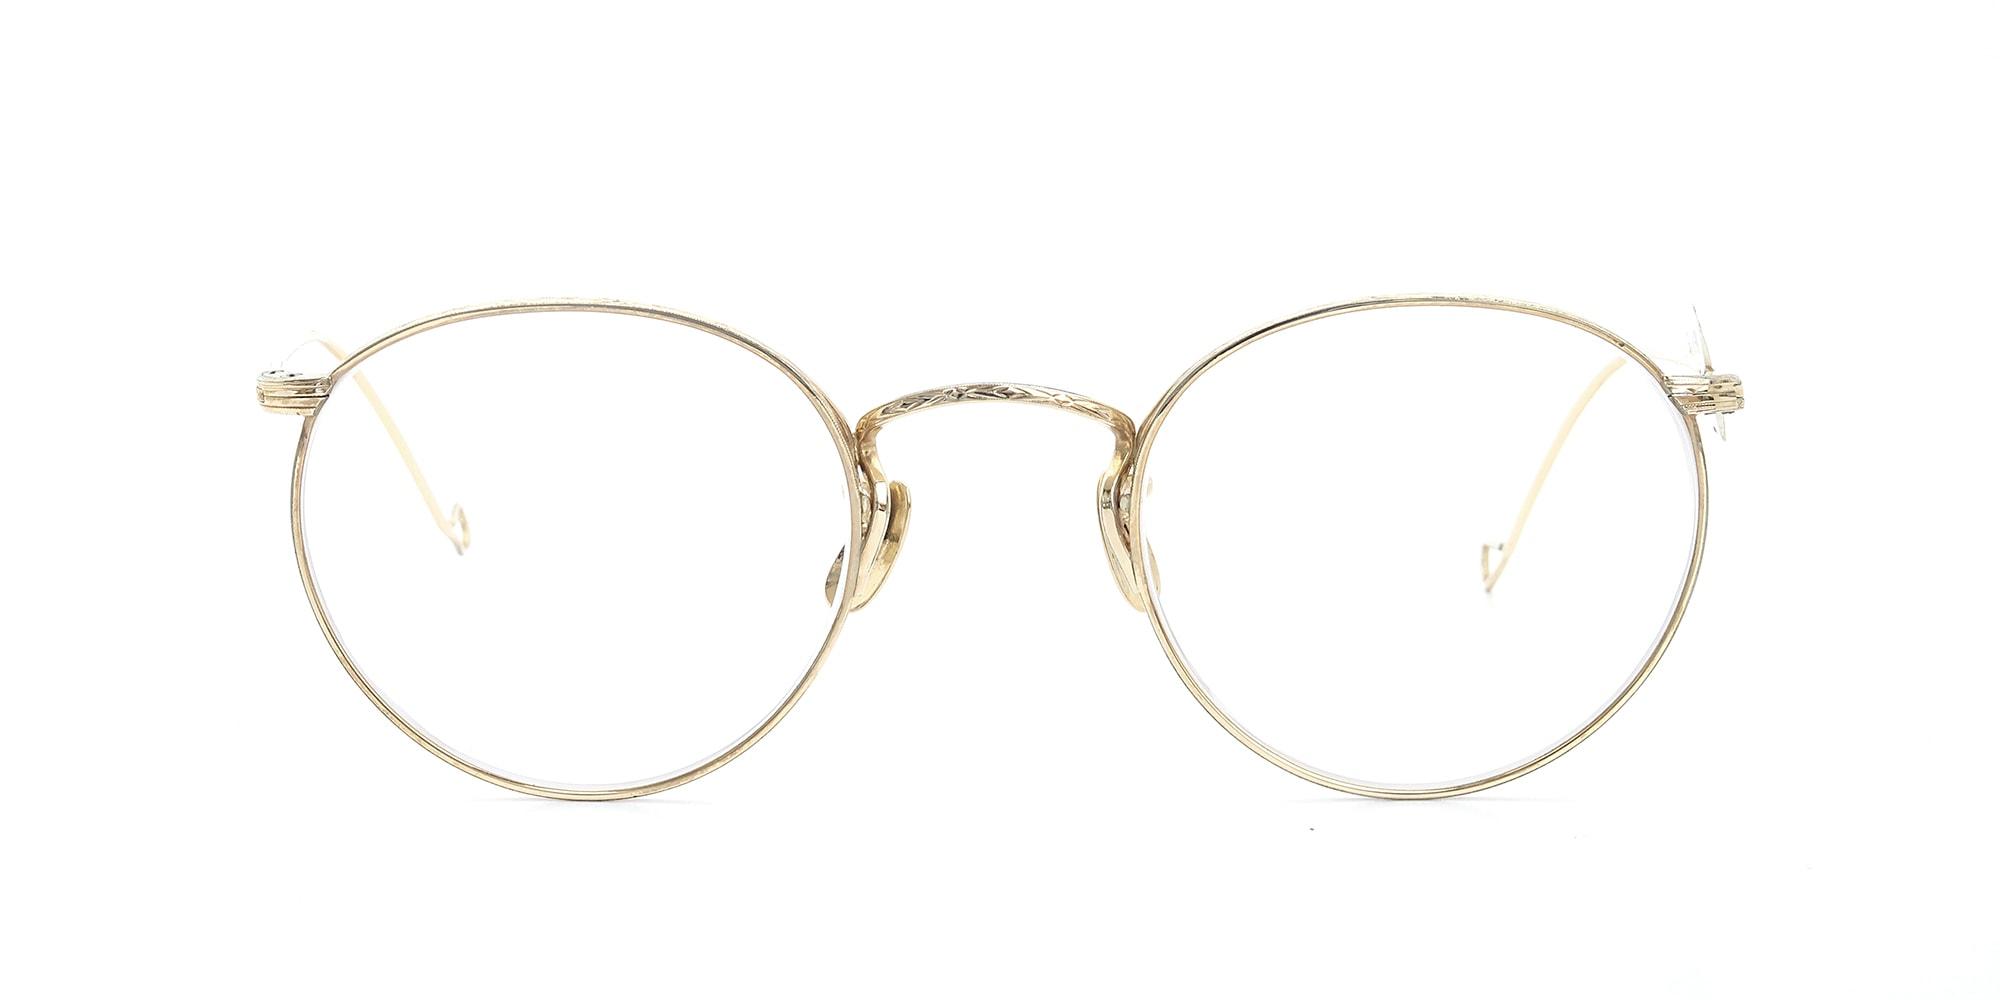 The Spectacle メガネ 1937 Artcraft Optical The-Artbit NOKOROD P-6 G 12kPads 46-22 イメージ3